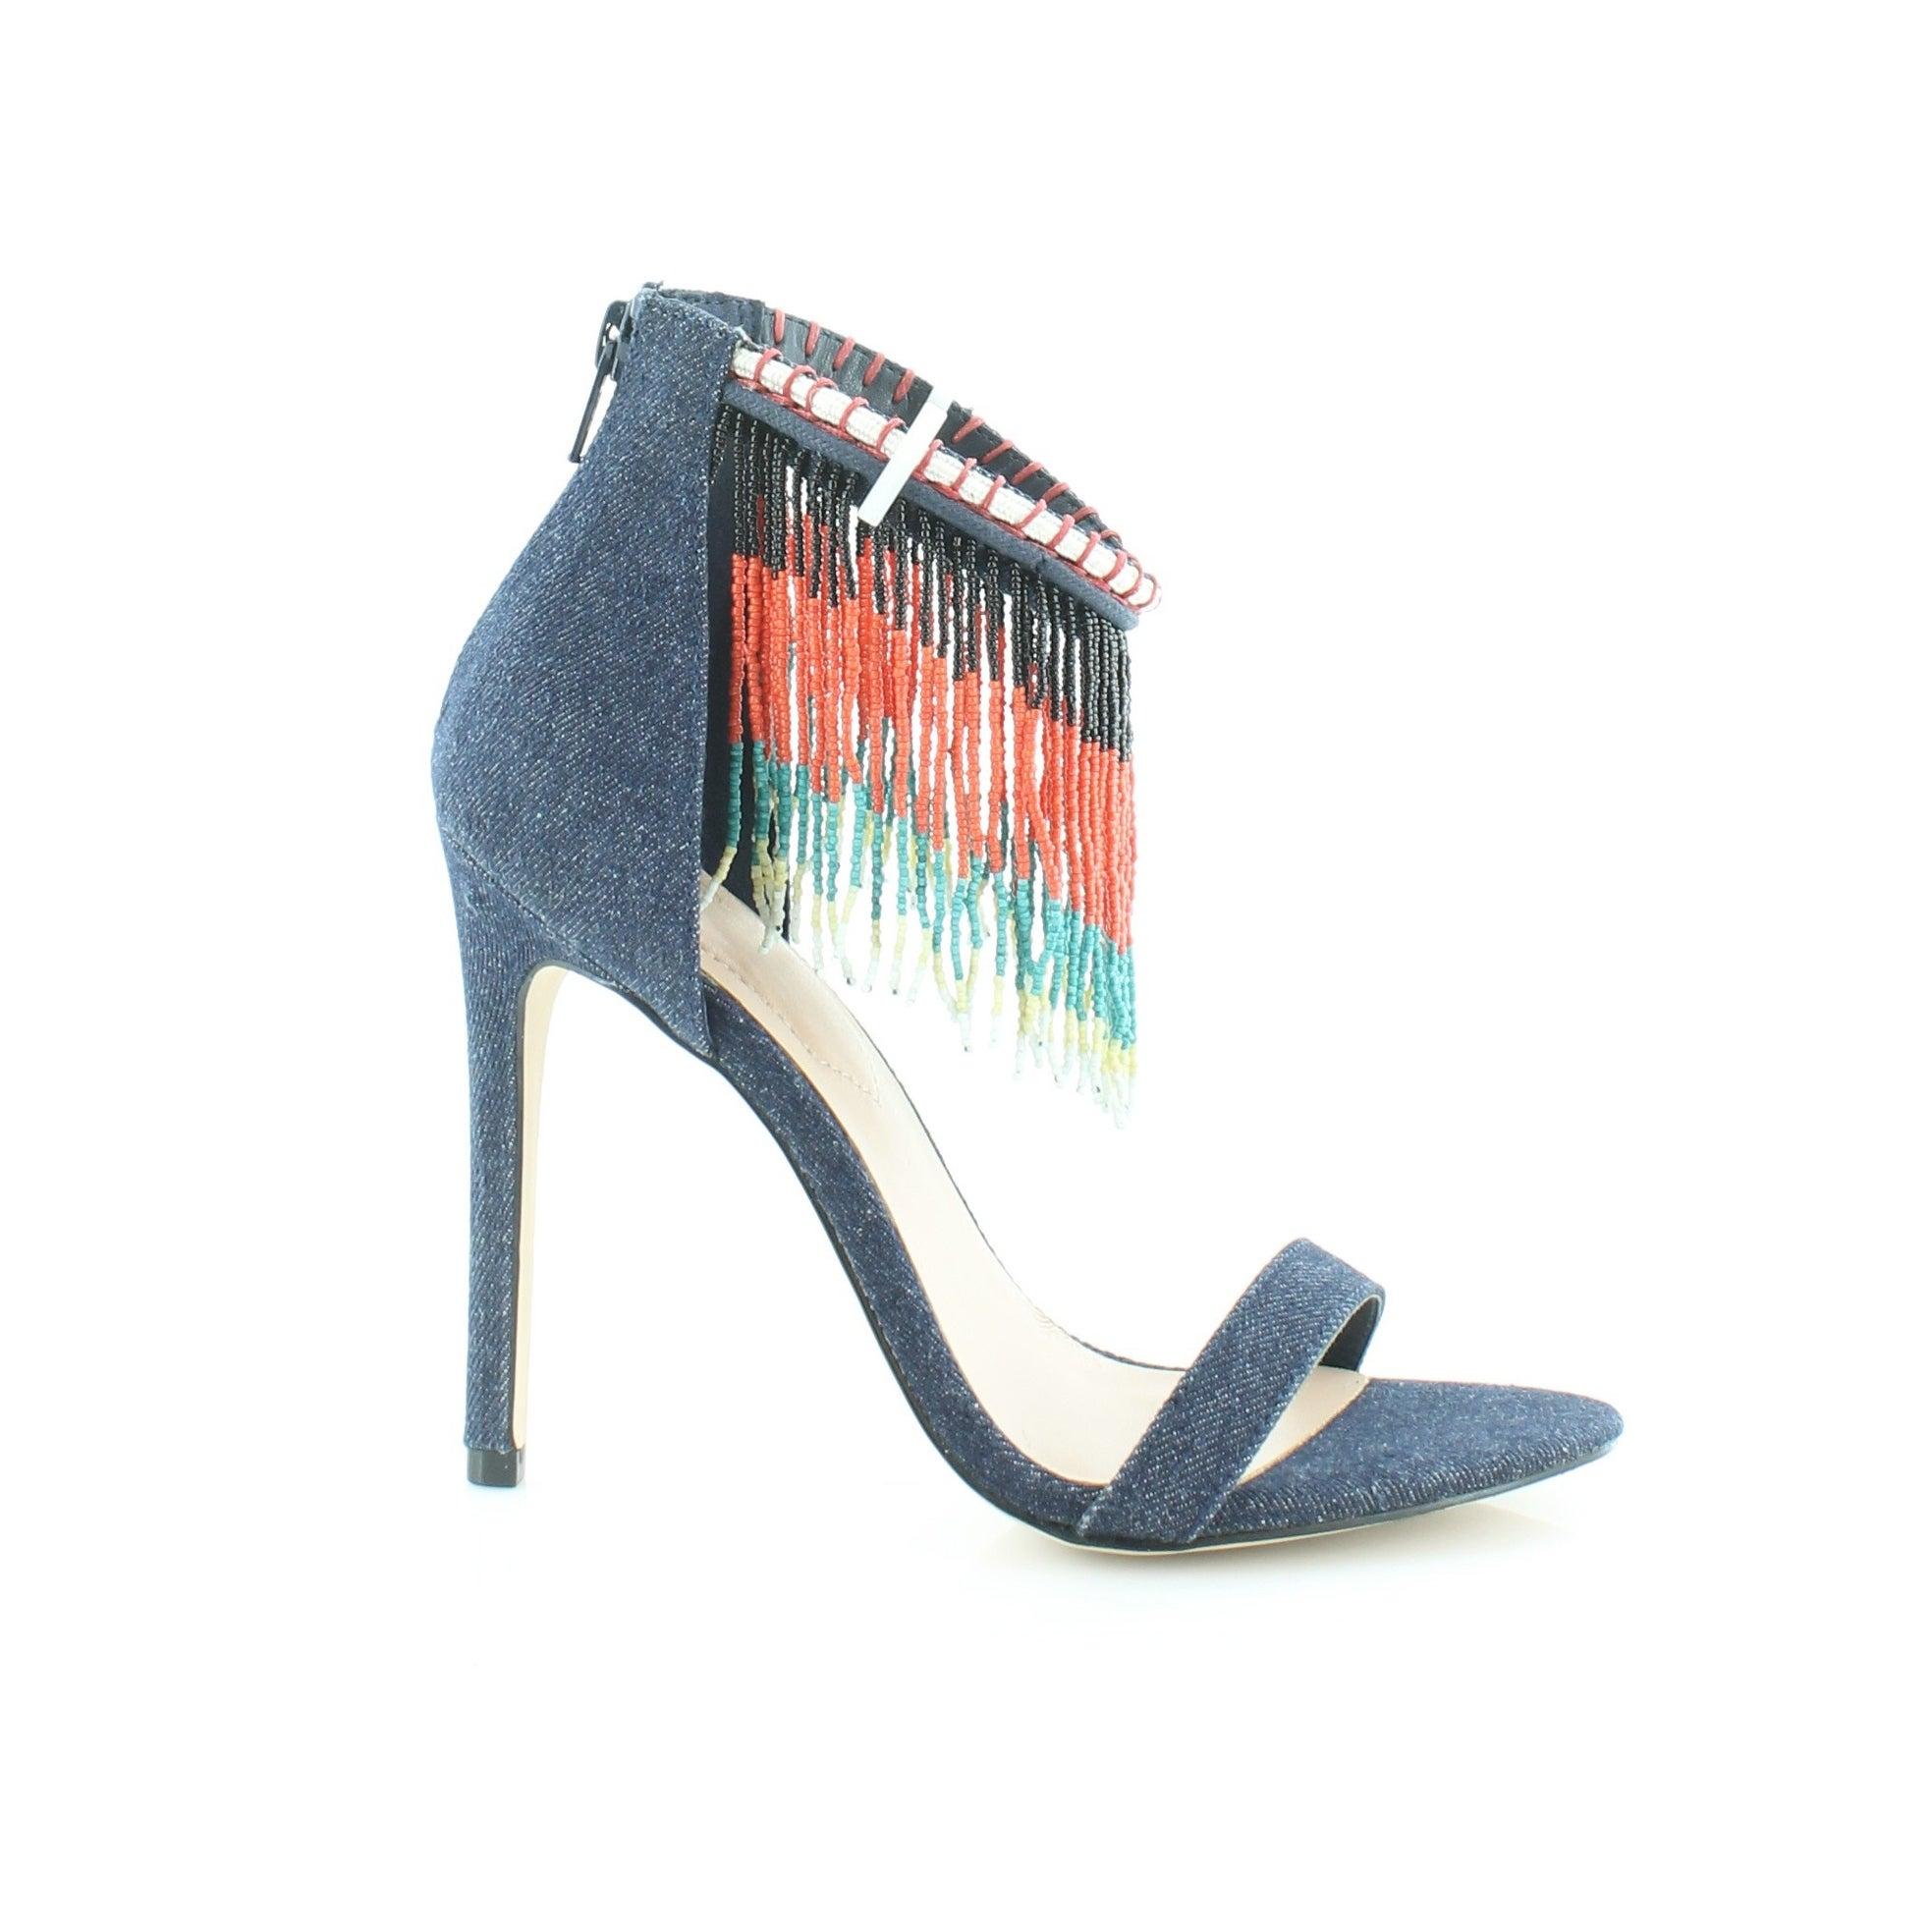 2101bf40765 Shop Aldo Franssie Women s Heels Medium Blue - Free Shipping On Orders Over   45 - Overstock - 23551313